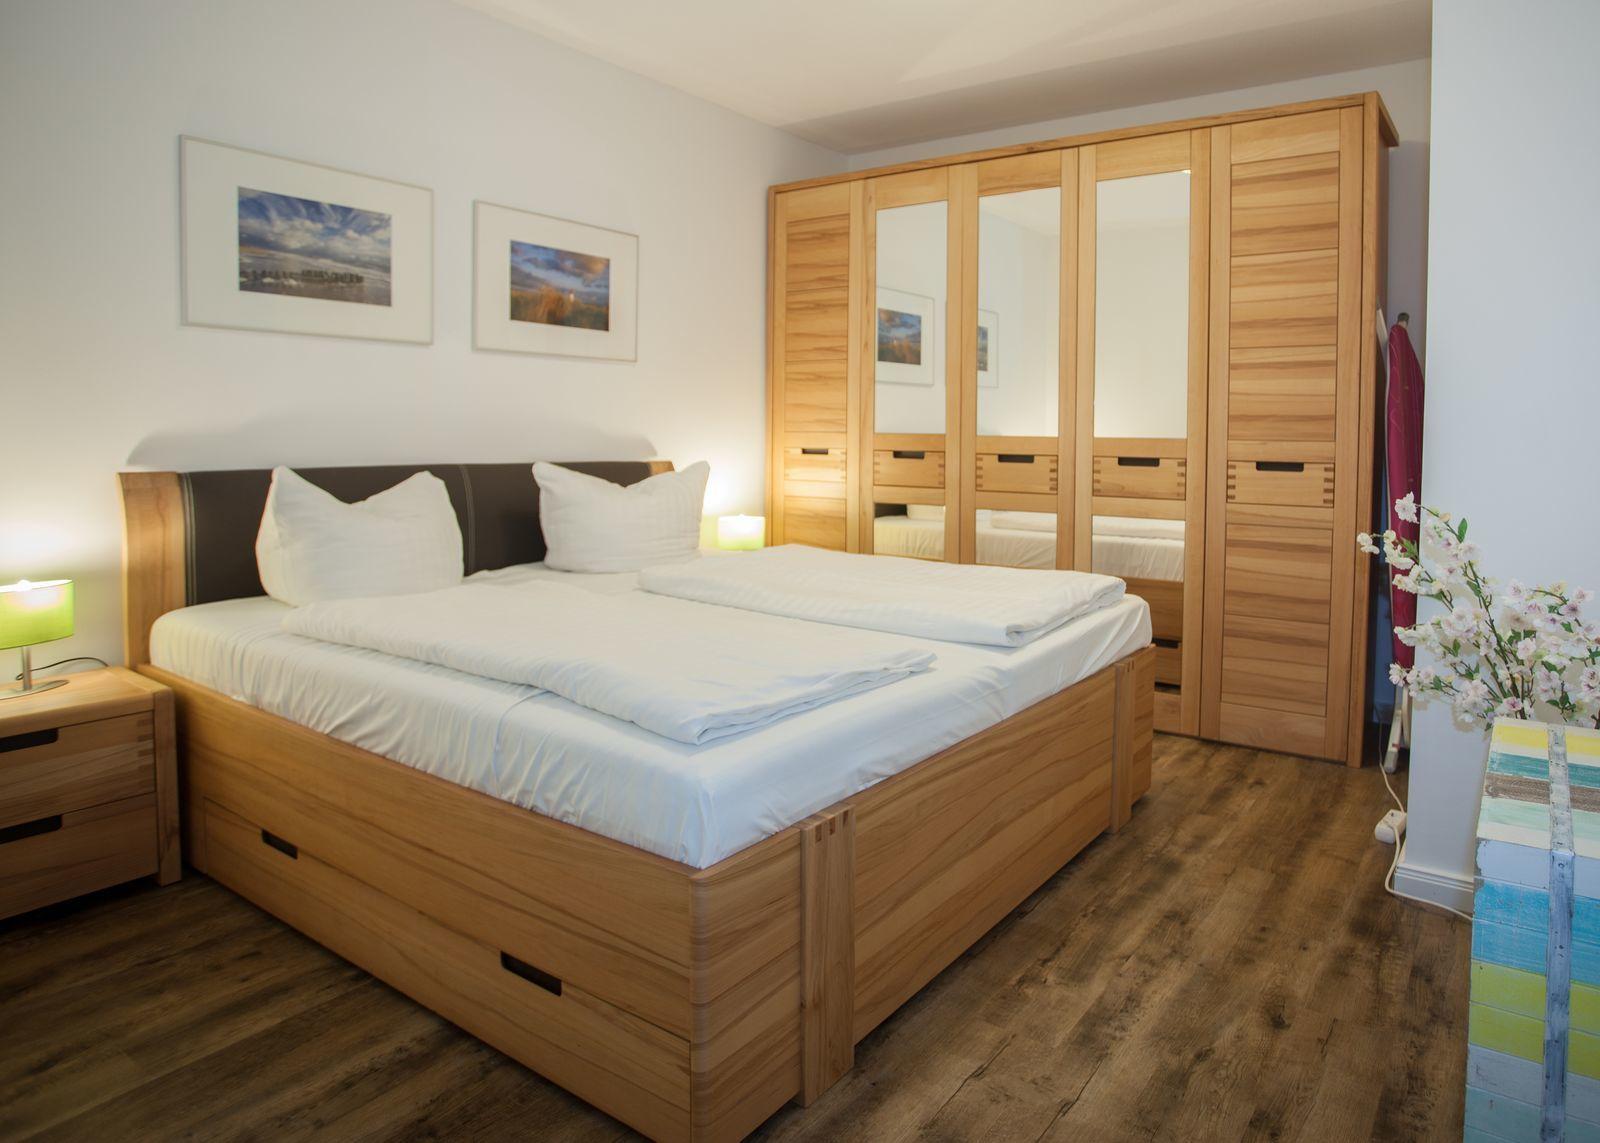 Apartment - Am Bergelchen 58-J | Winterberg-Niedersfeld